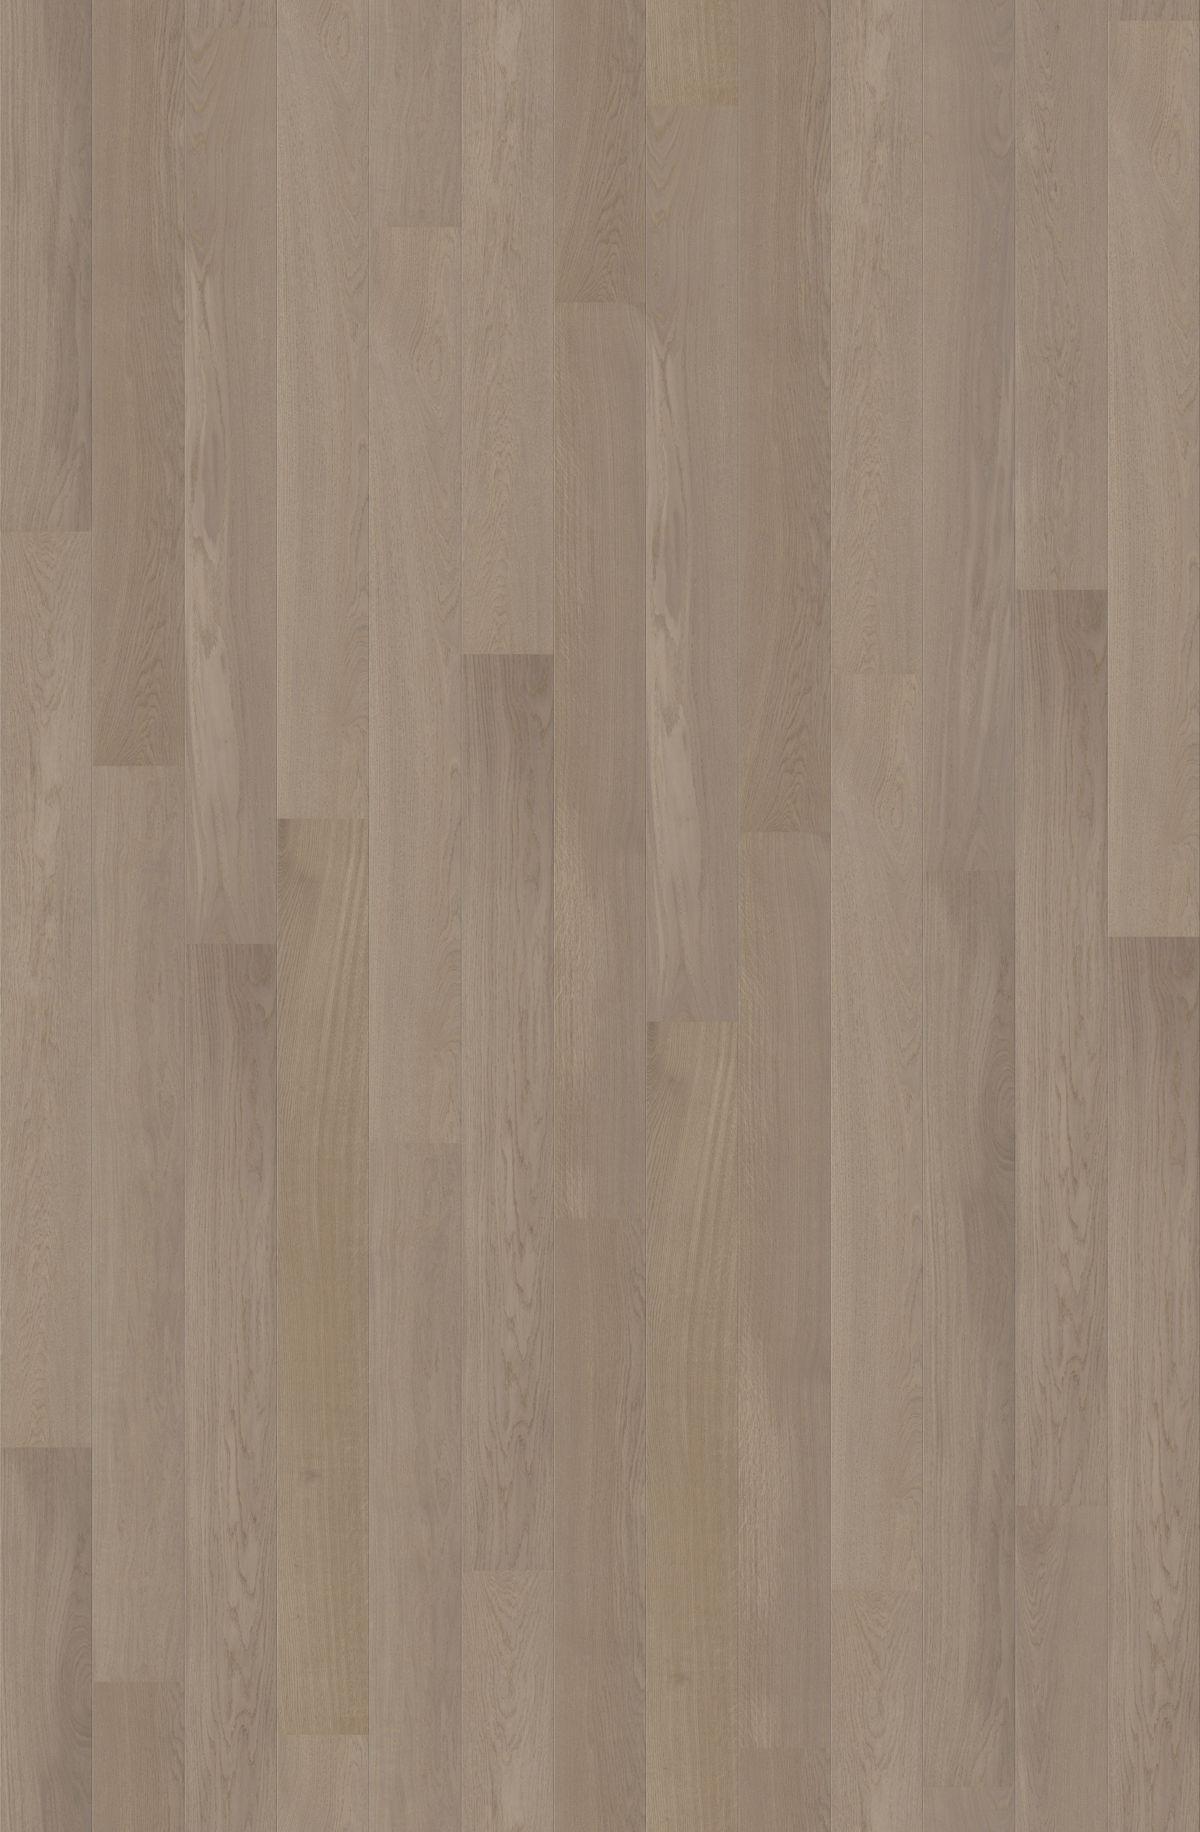 Quickstep Palazzo Fossil Oak Matt Pal1342s Engineered Wood